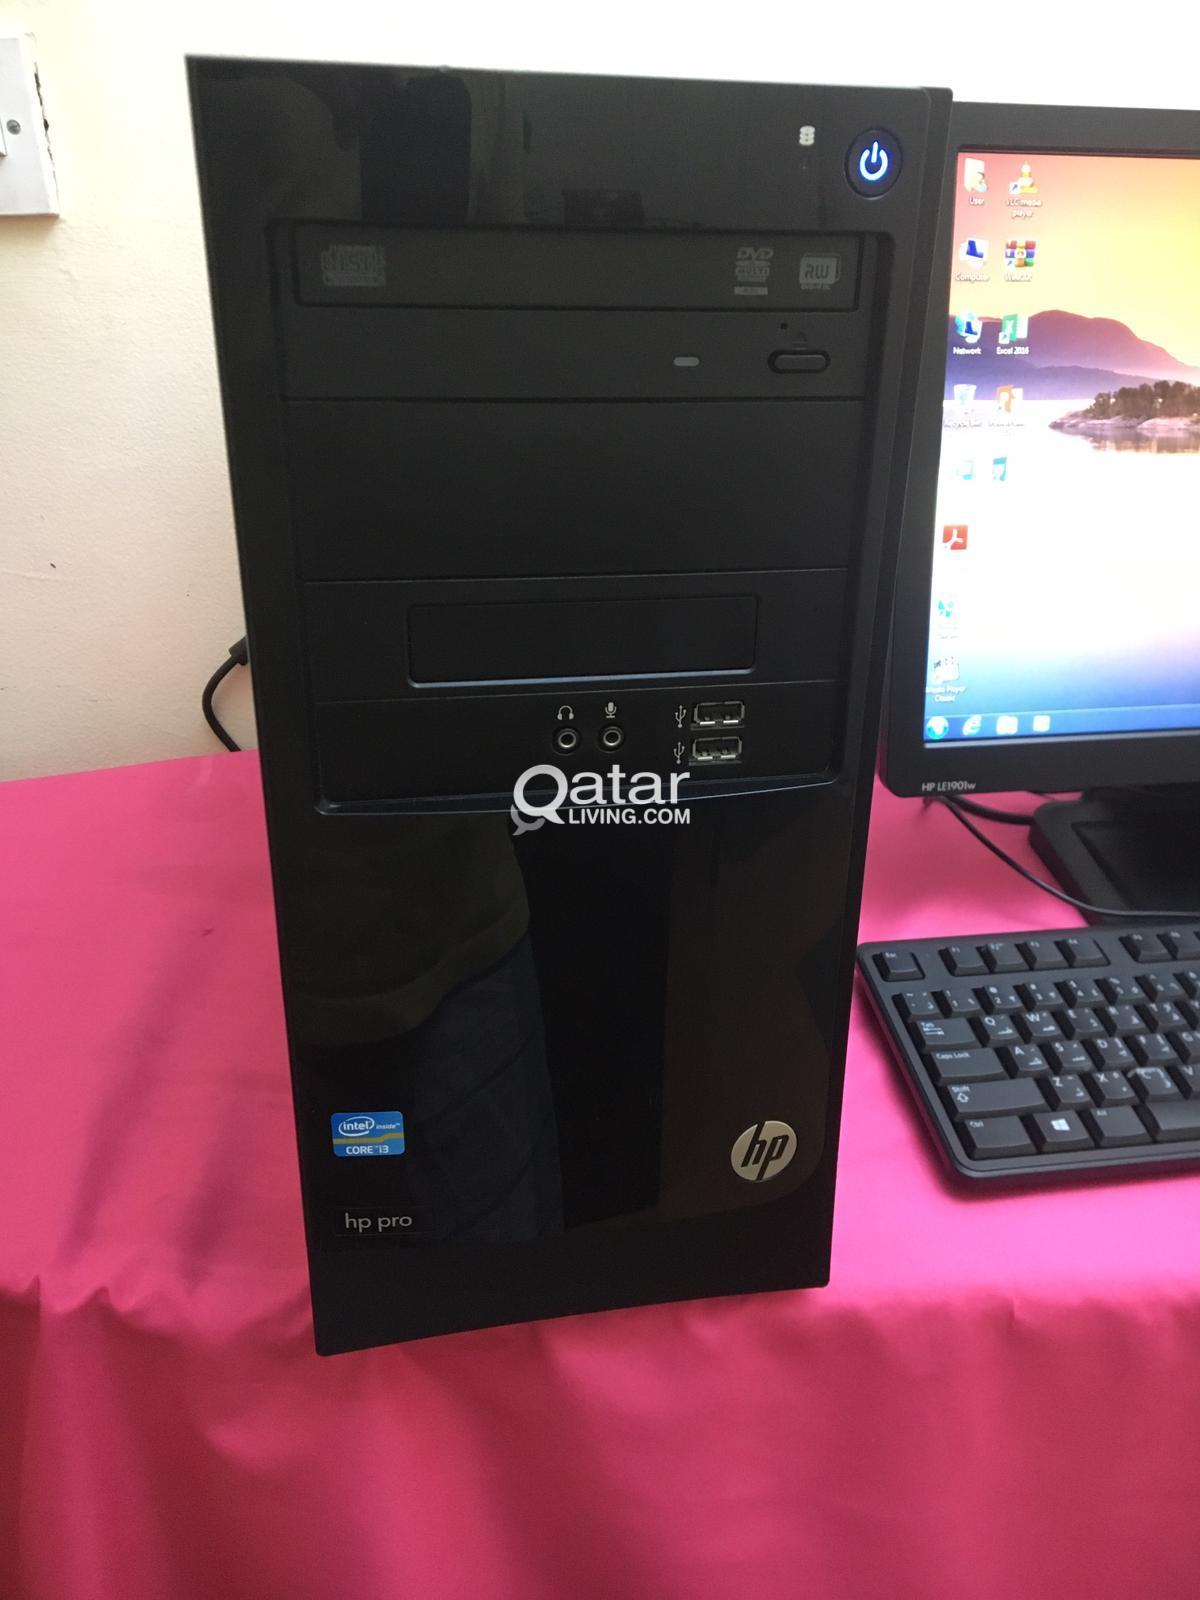 computer set on sale HP Pro 3330 Micro Tower | Qatar Living